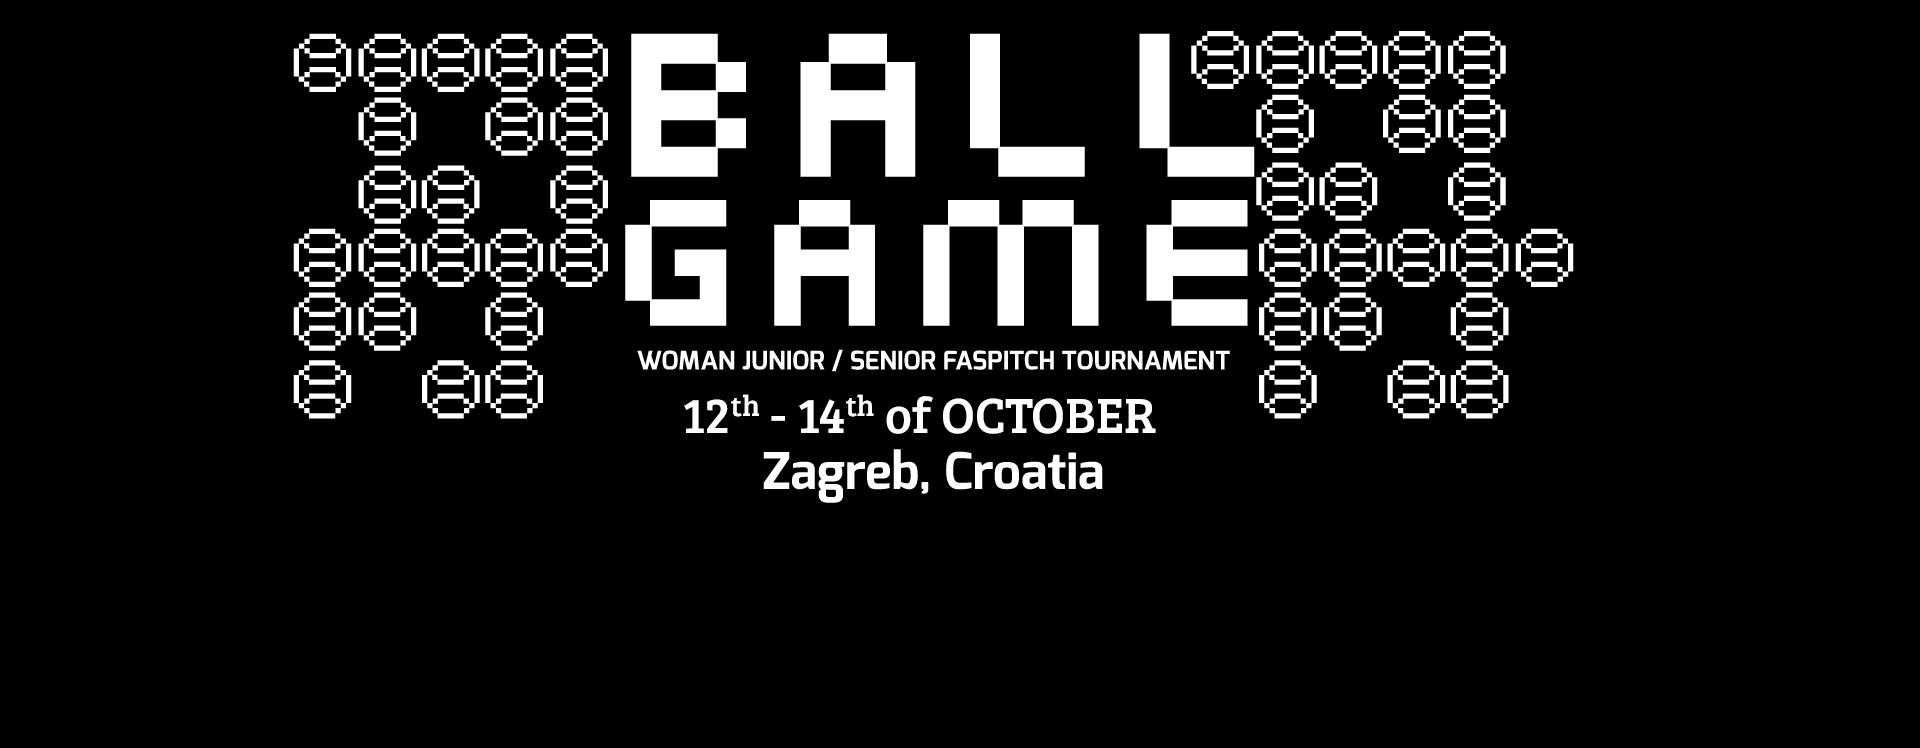 ball-game-pozadina-1-1